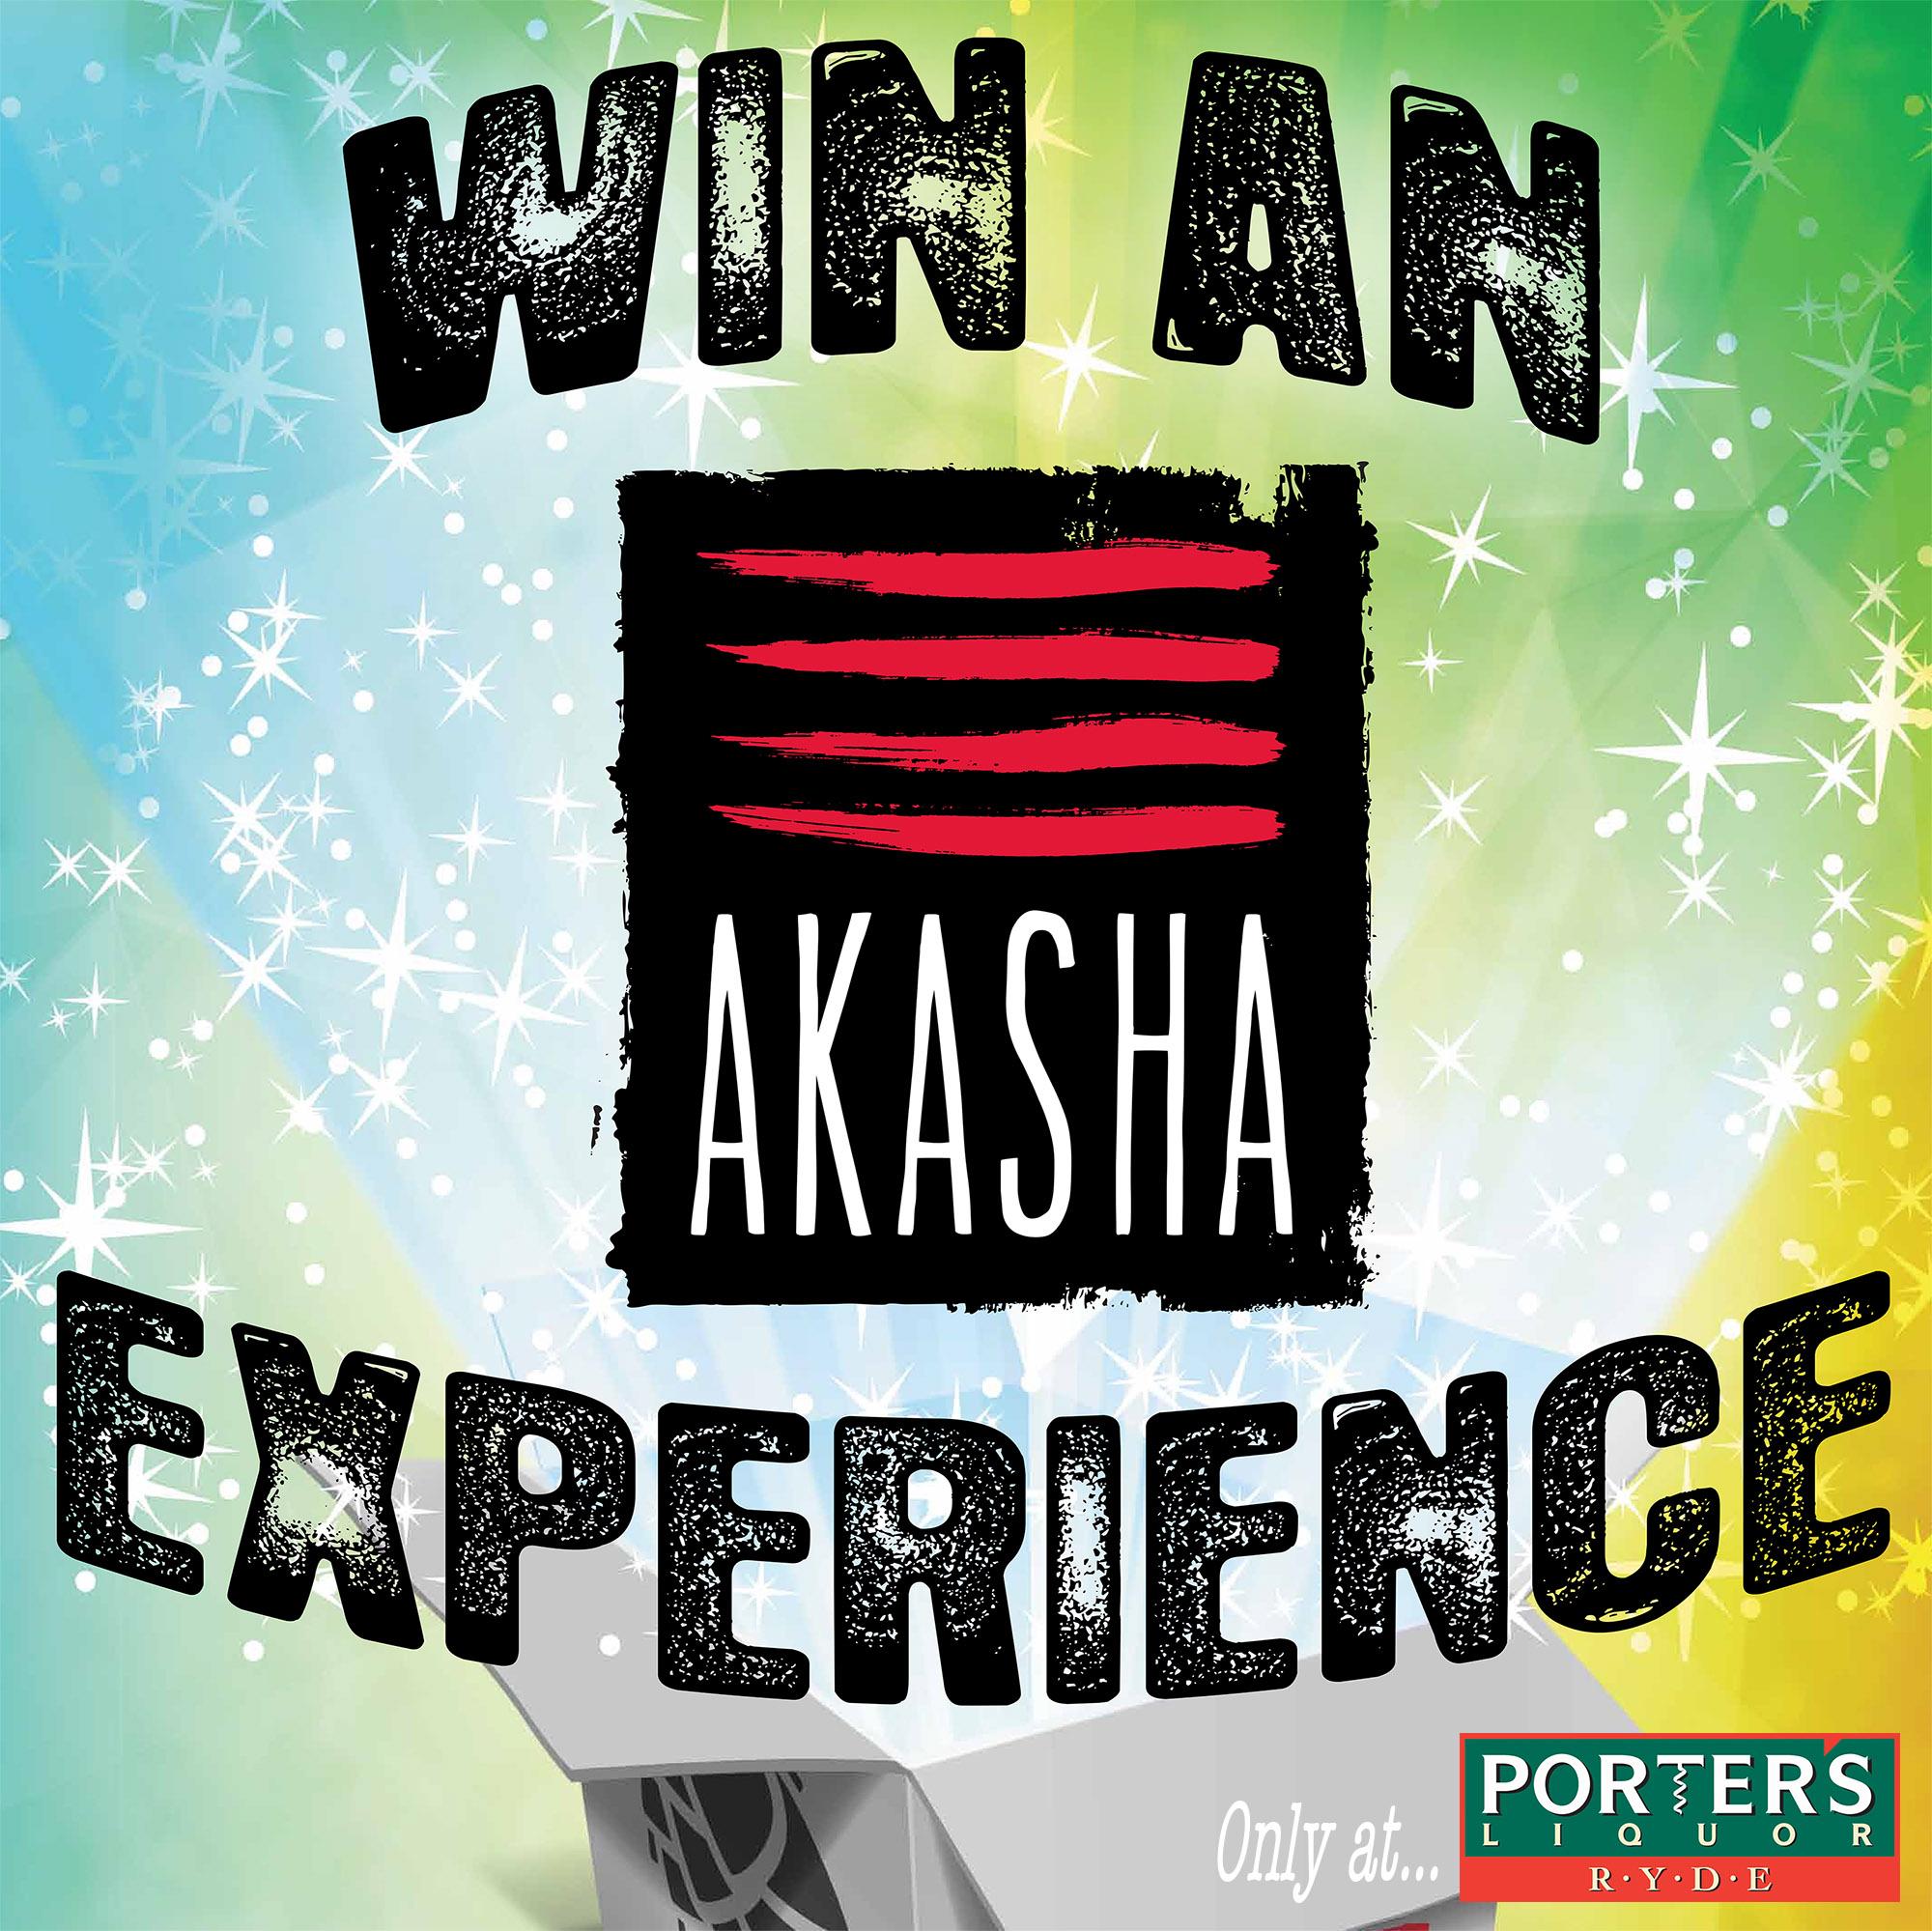 AkashaFinalposter_insta3.jpg